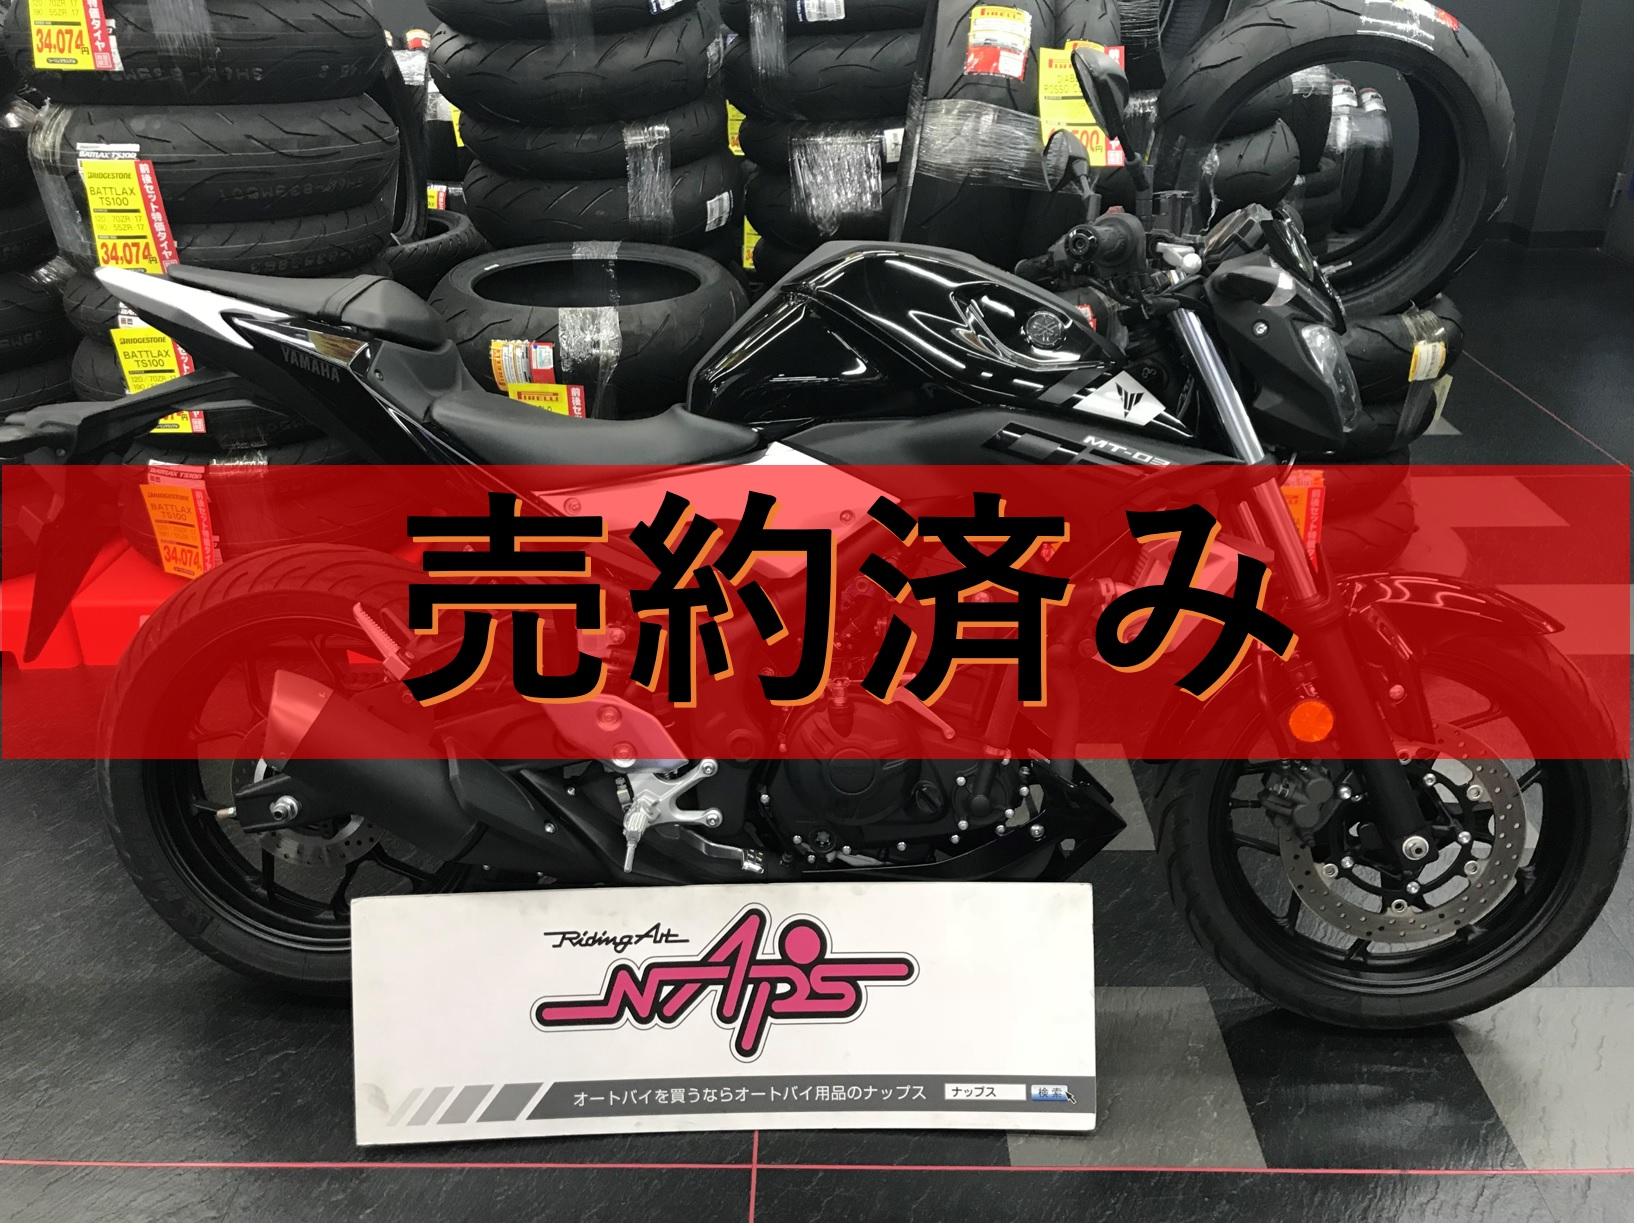 YAMAHA 【販売車両】YAMAHA MT-03 ETC HID セキュリティ